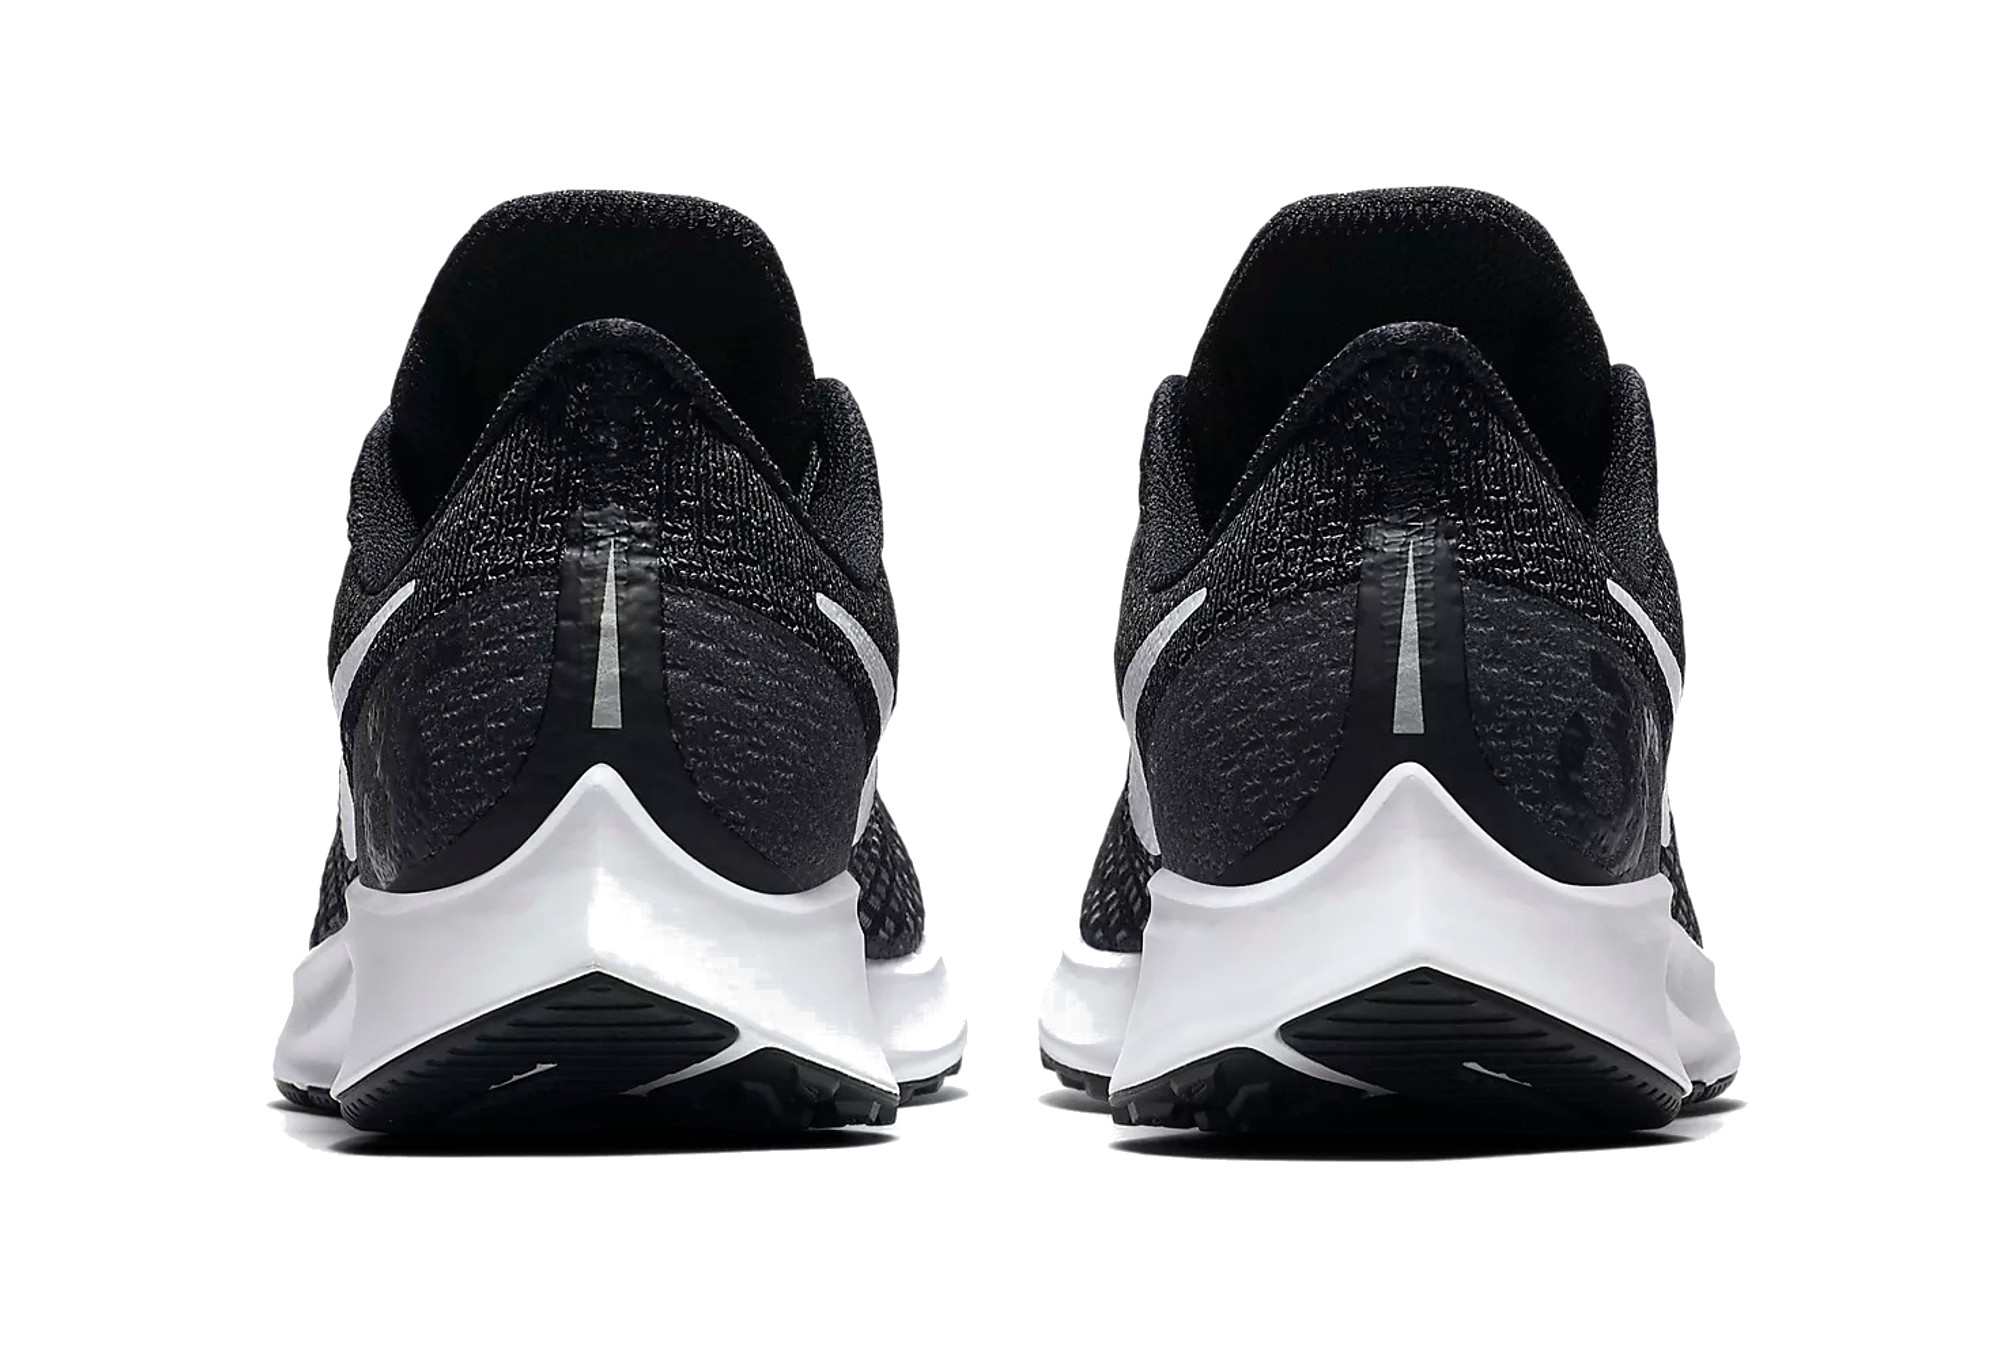 big sale 51072 c7b13 Chaussures de Running Femme Nike Air Zoom Pegasus 35 Noir   Blanc